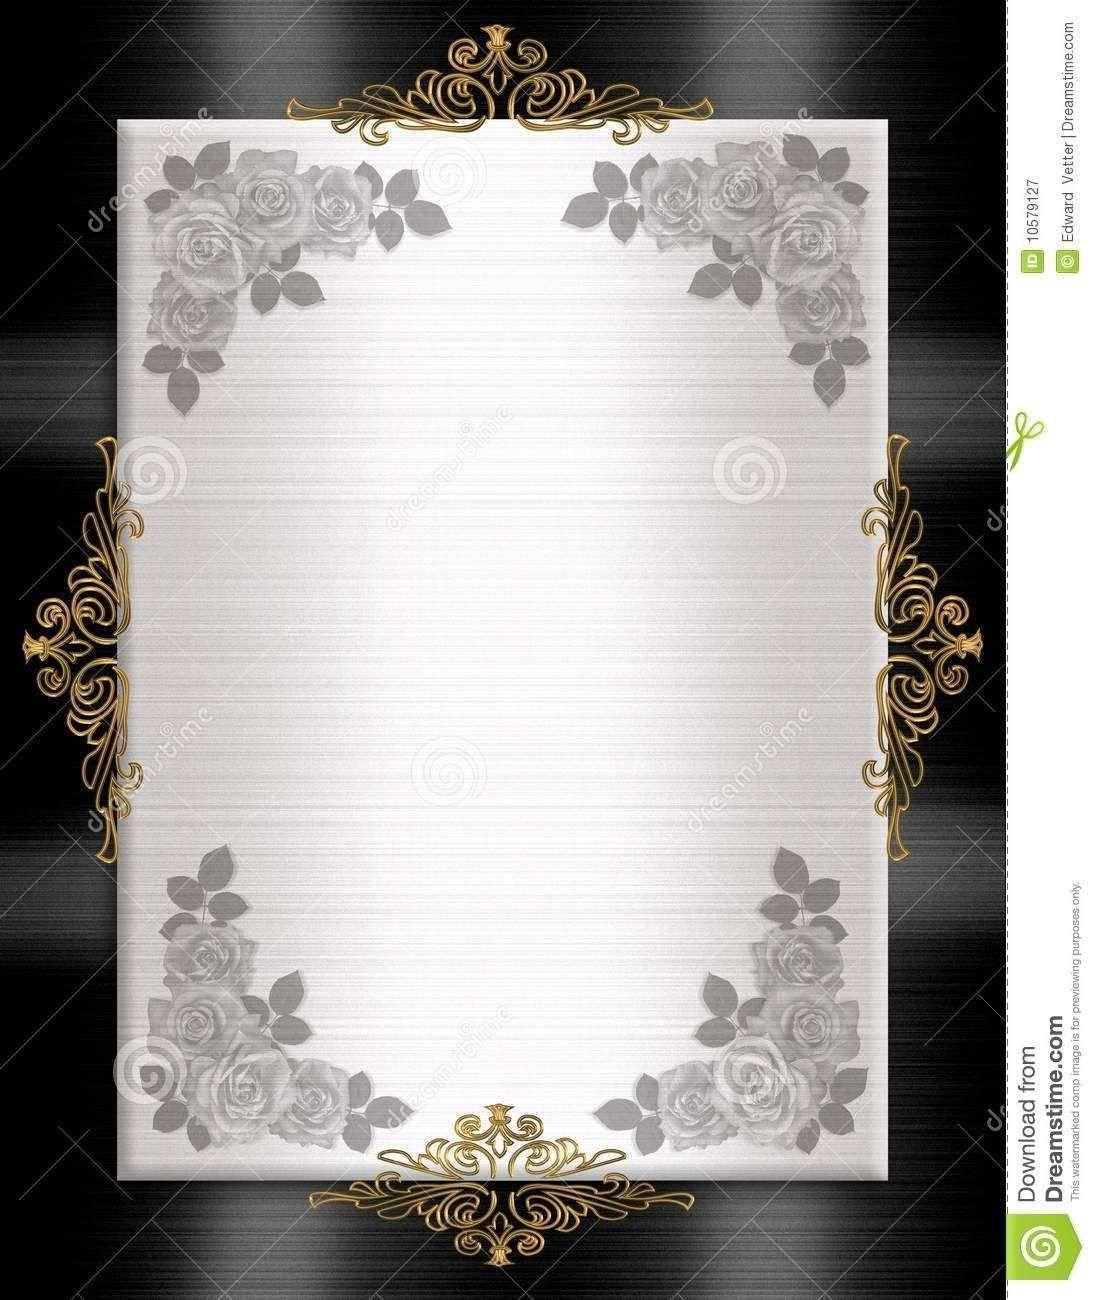 001 Wonderful Black And Gold Invitation Template Sample  Design White Free PrintableFull